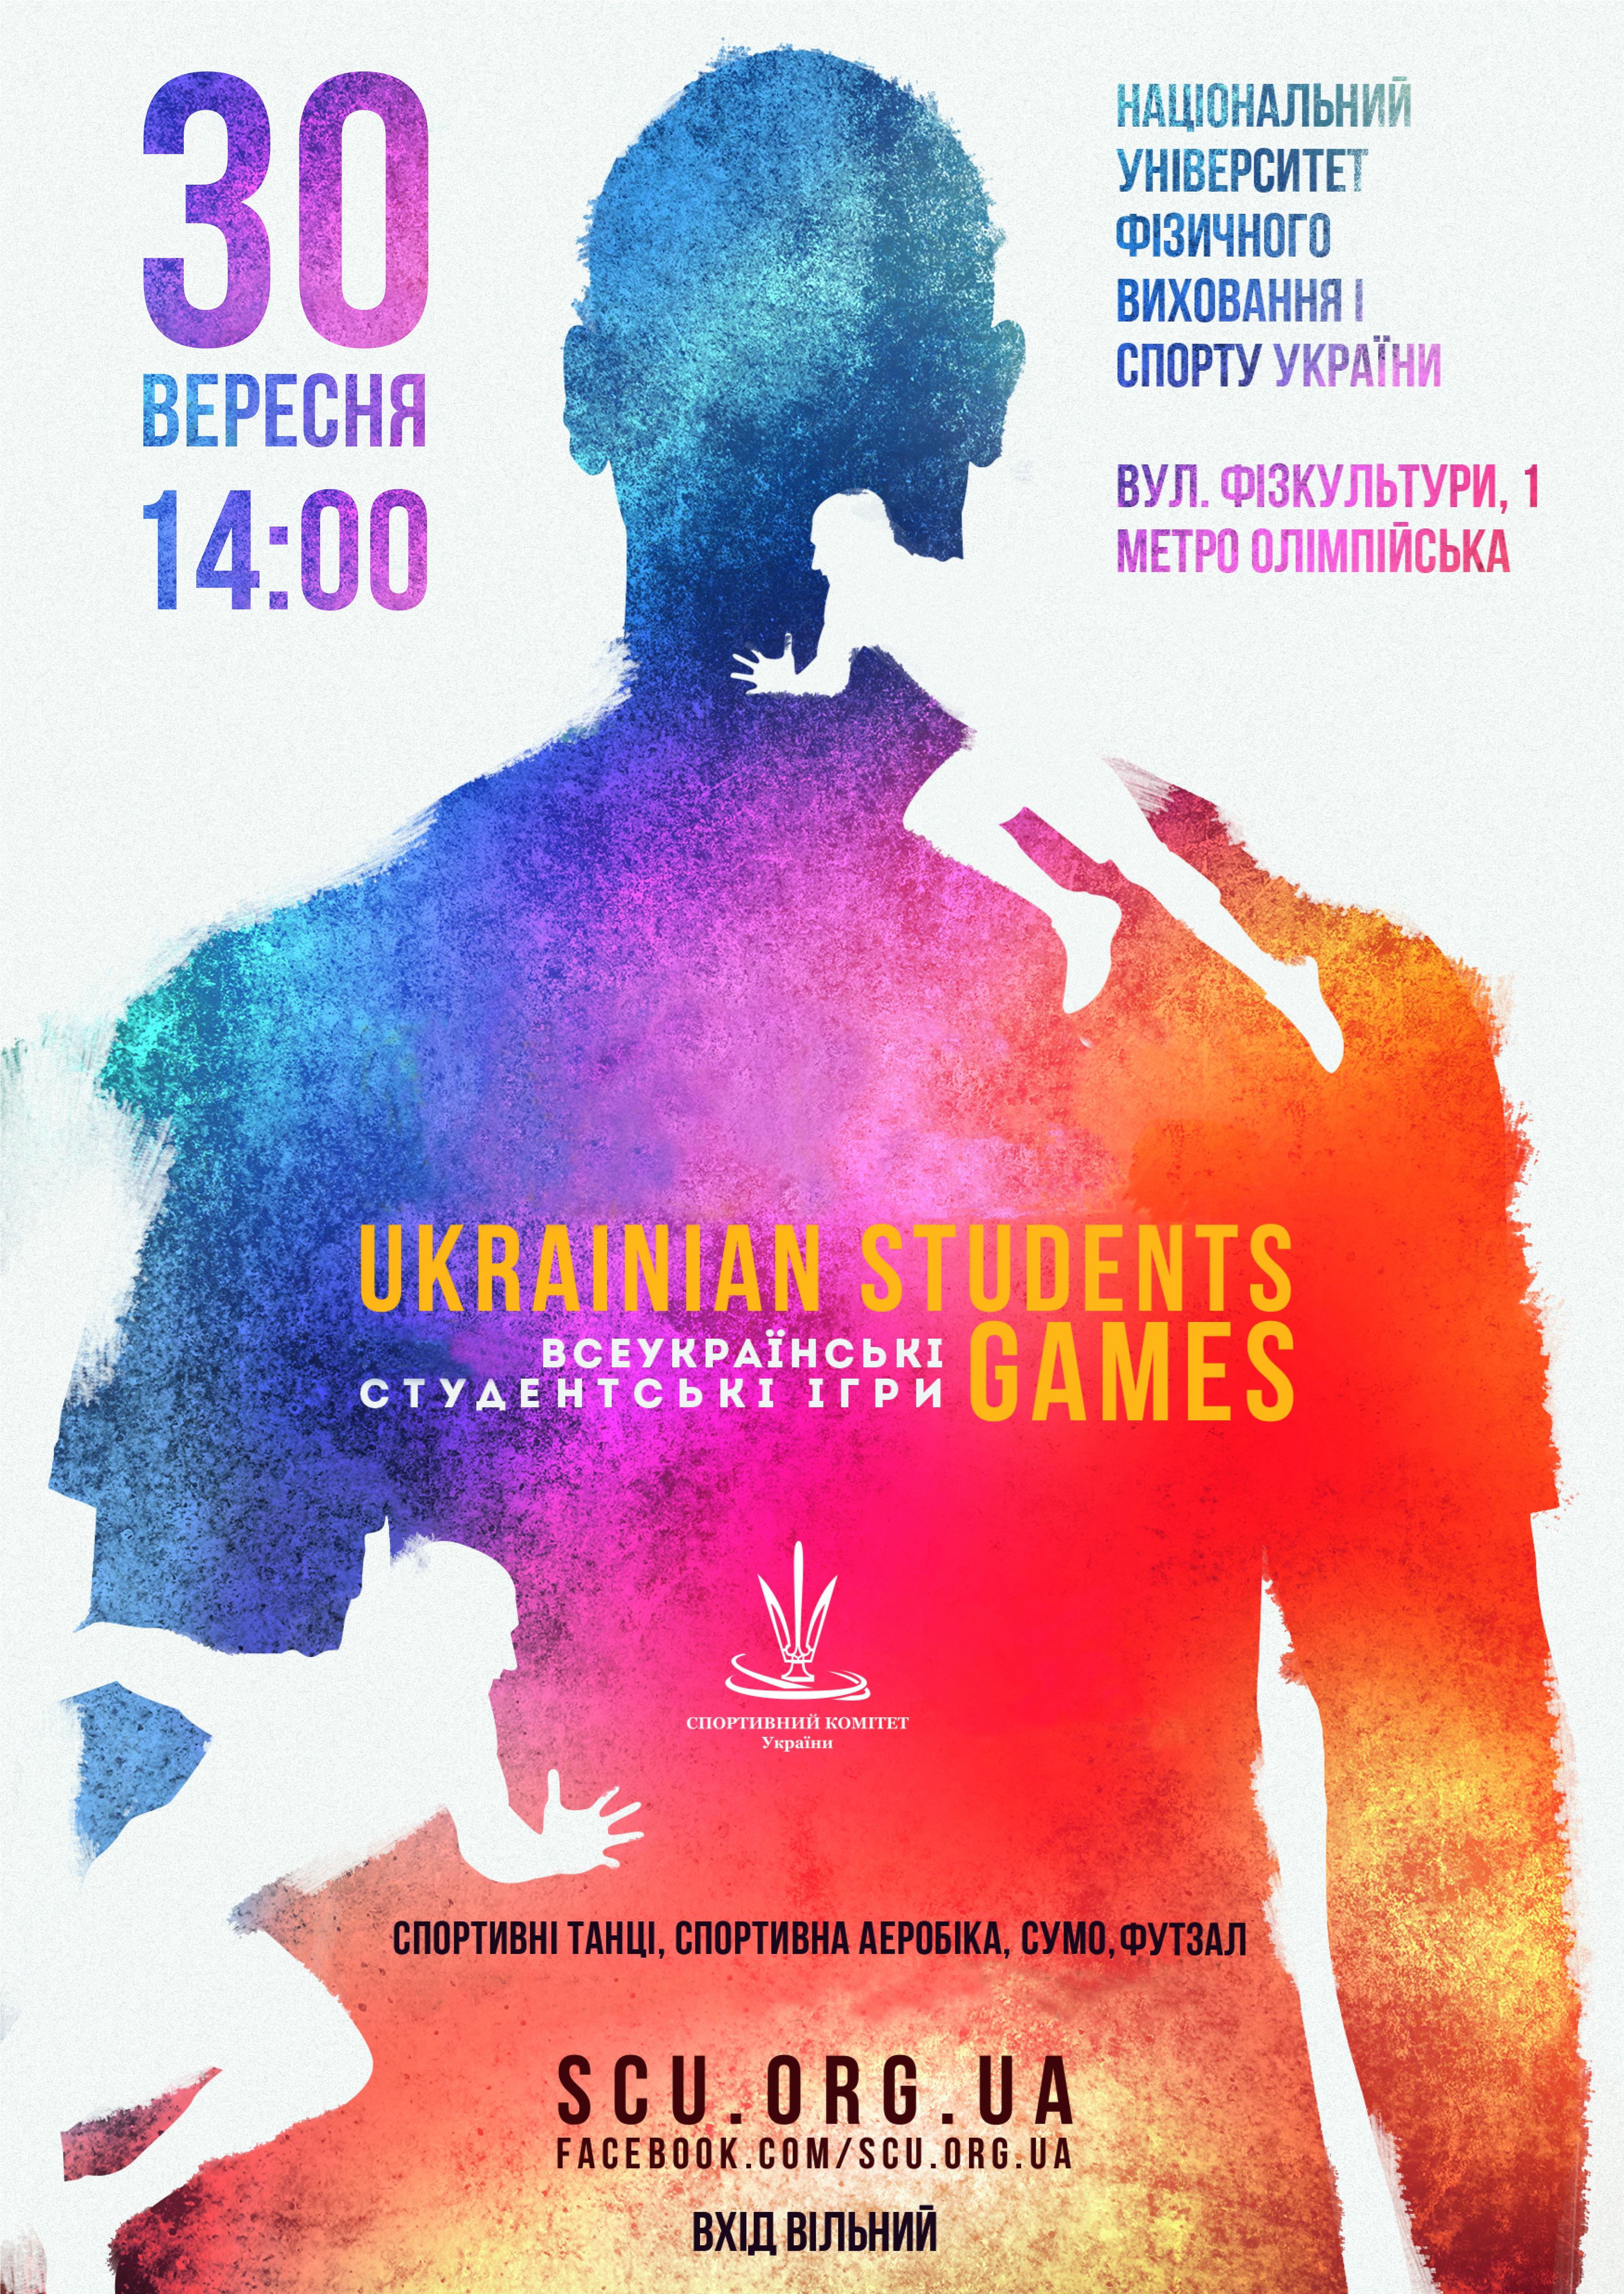 images/ukrainian_students_games_banner